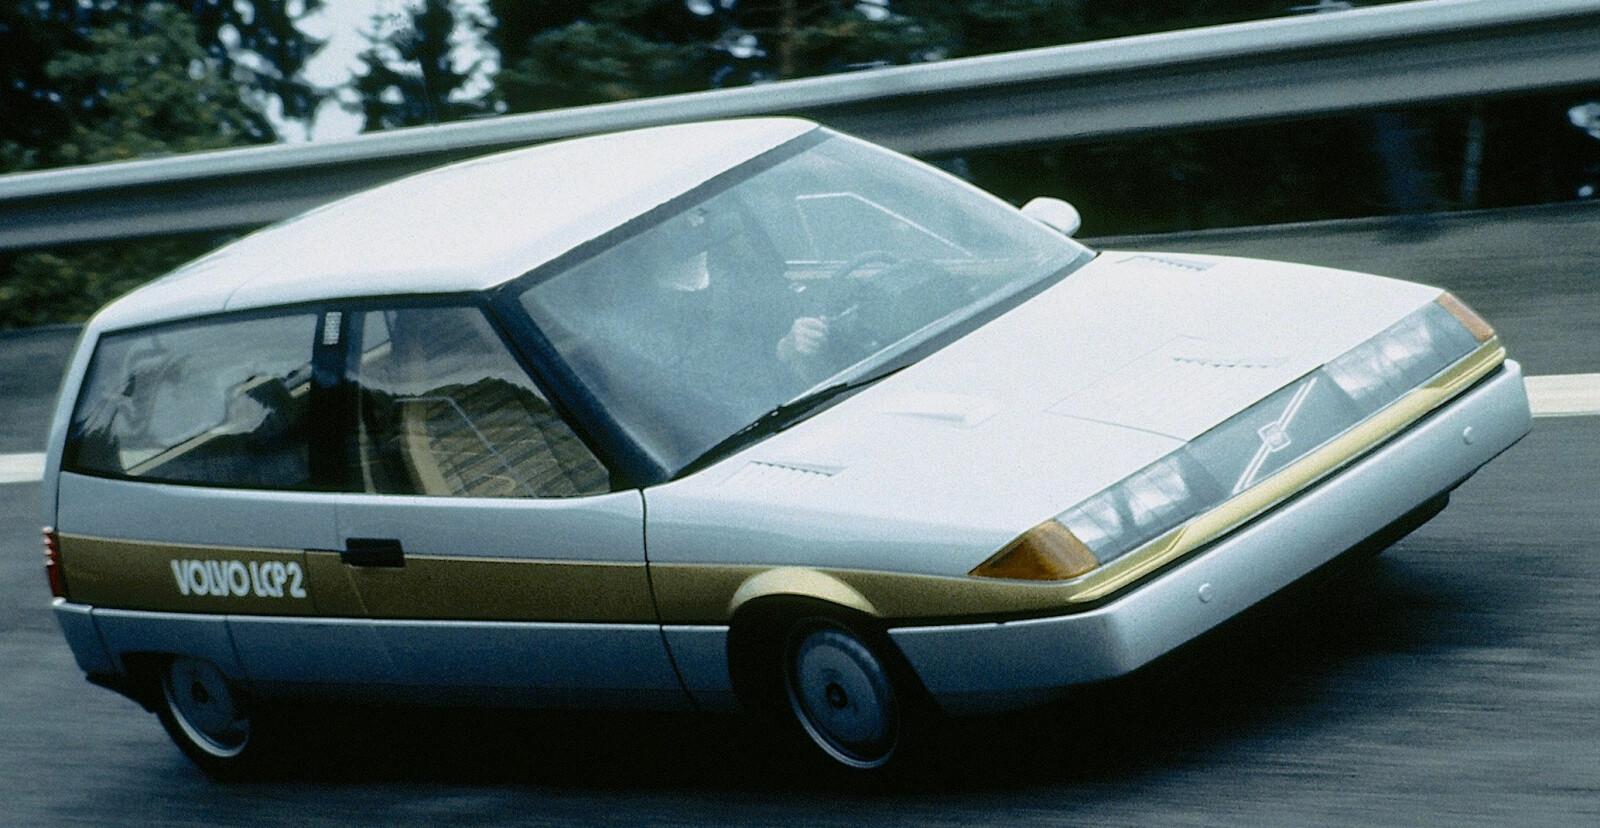 <b><SPAN CLASS=BOLD><STRONG>LETTVEKTER:</b></strong> </span>Volvo Light Component Project 2000 resulterte i en bil som lå langt forut sin tid. Den veide bare 700 kilo og var en ladbar hybrid.